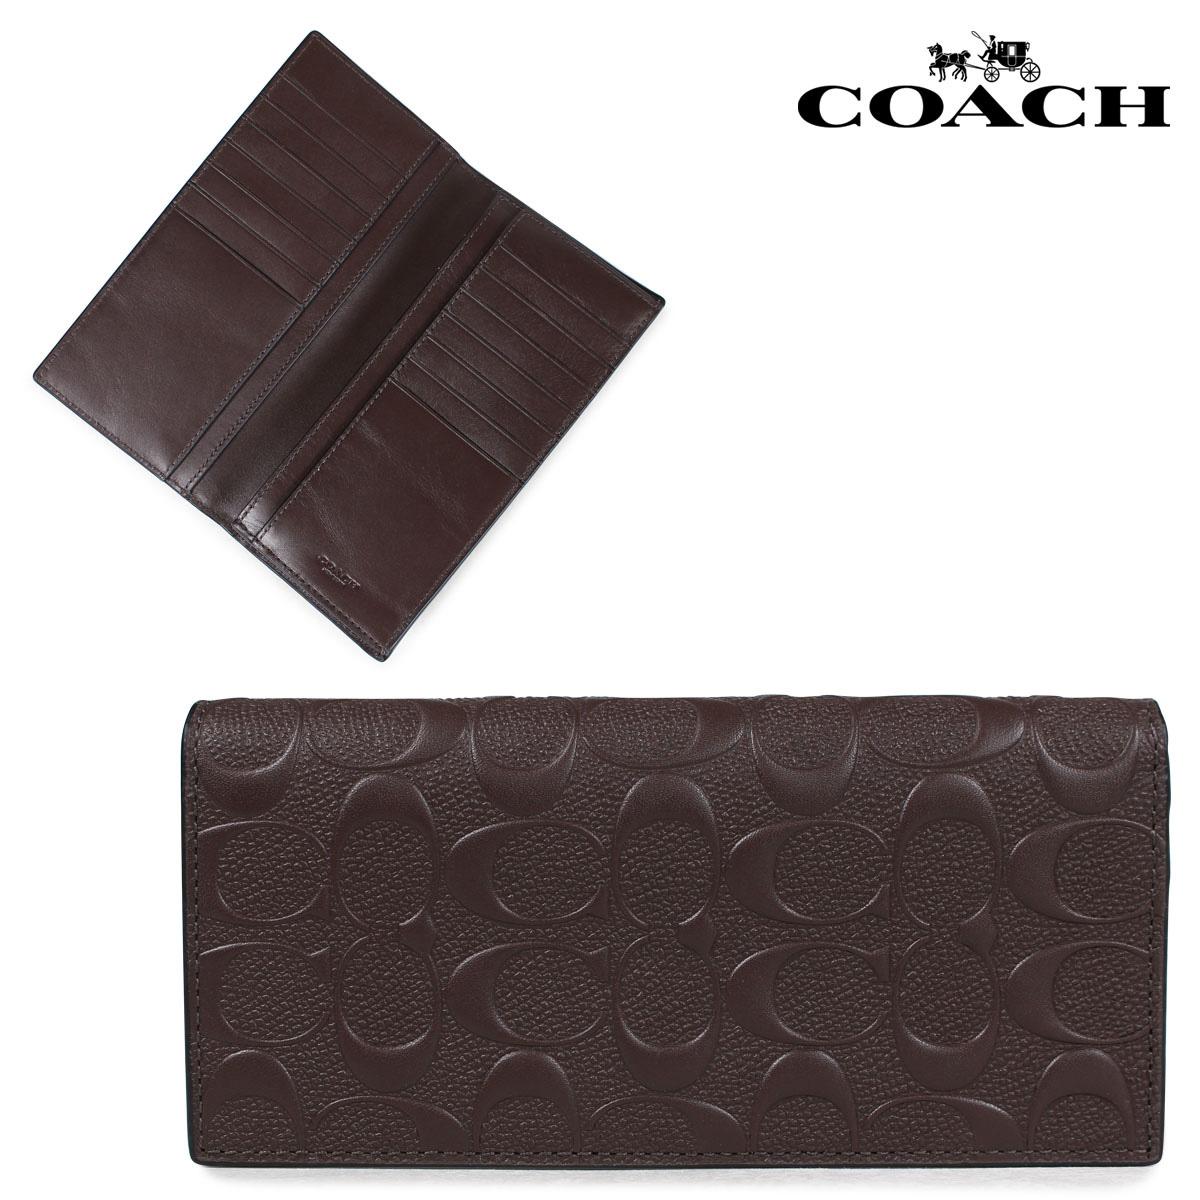 COACH コーチ 財布 長財布 メンズ レザー シグネチャー ブラウン F75365